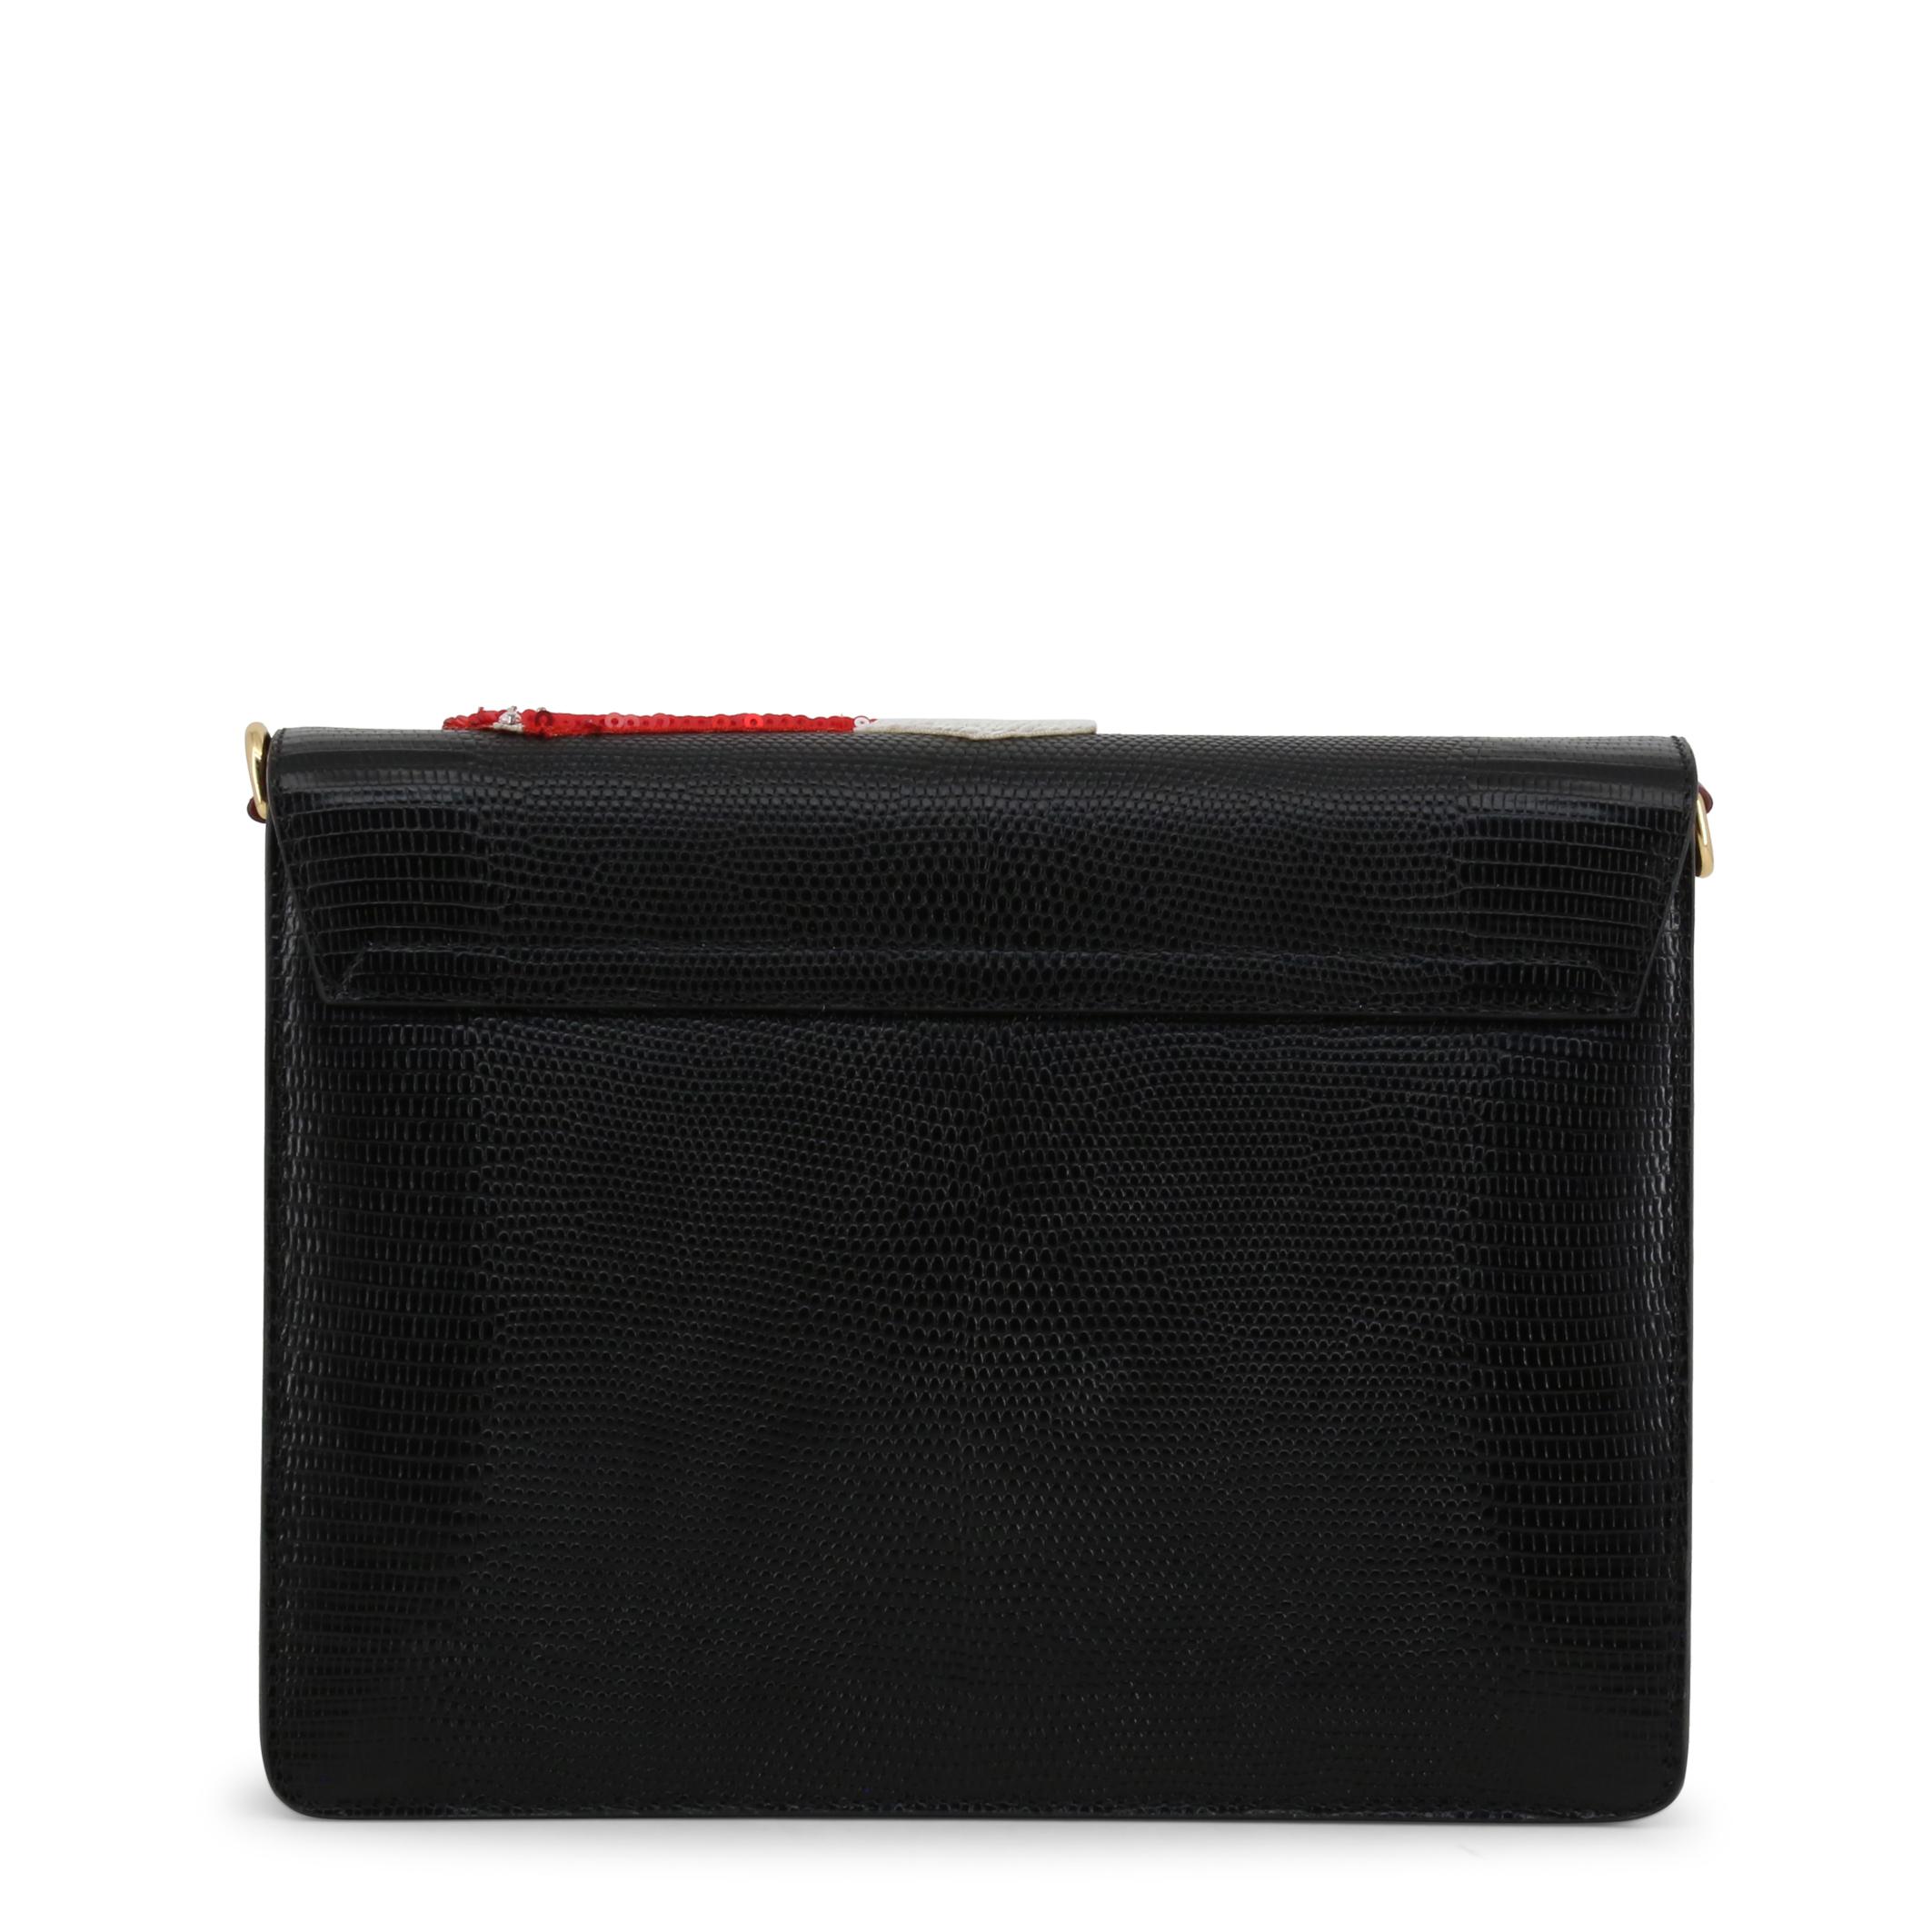 Borse-a-tracolla-Dolce-amp-Gabbana-BB631AAS4768-Donna-Nero-100109 miniatura 3